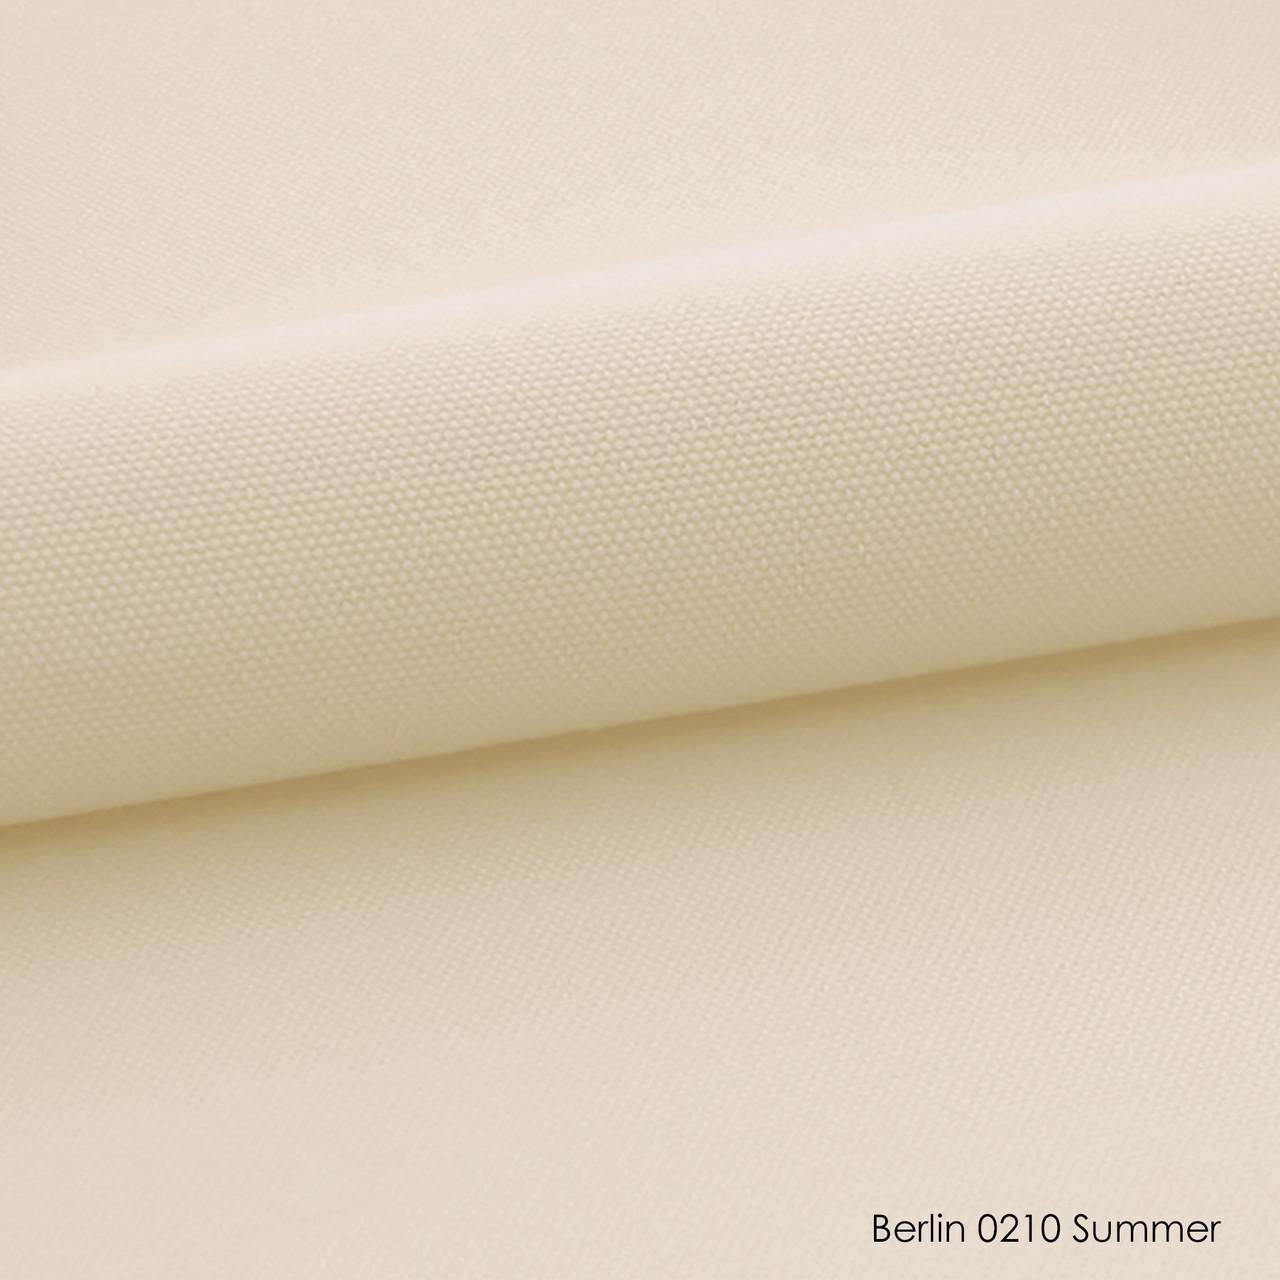 Ролети тканинні Berlin 0210 summer